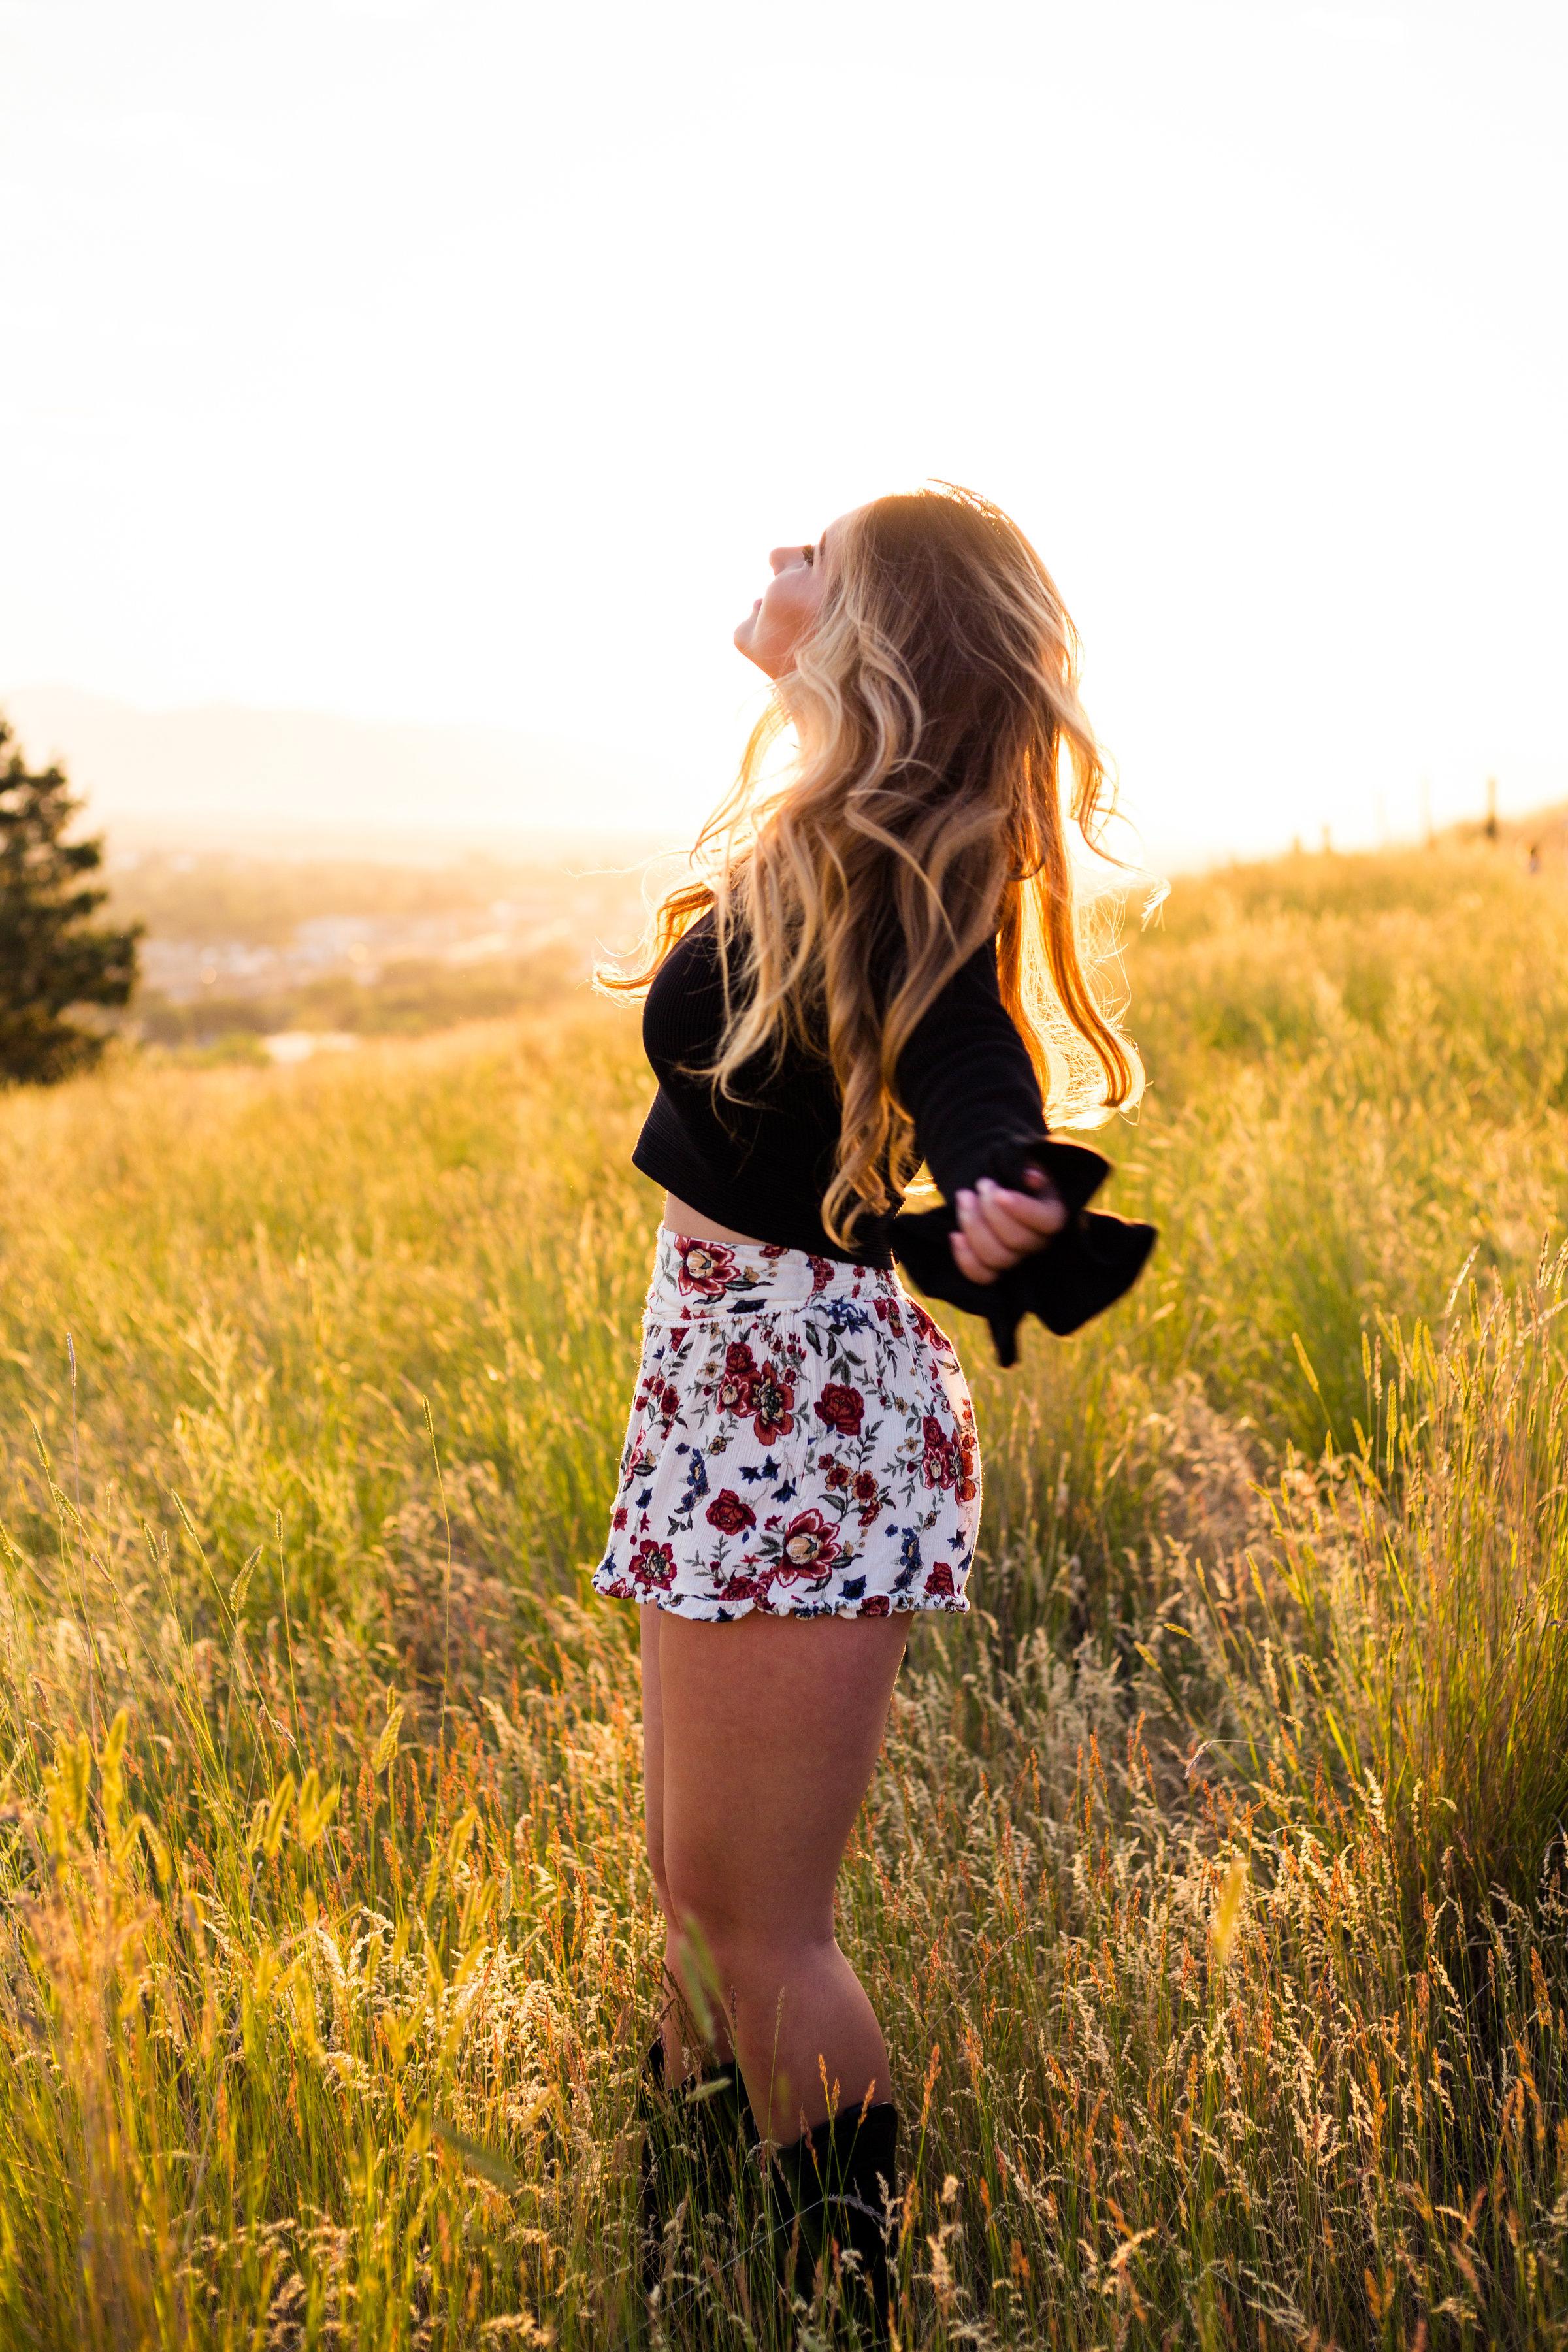 missoula-montana-senior-photographer-apaytonphoto-11.jpg